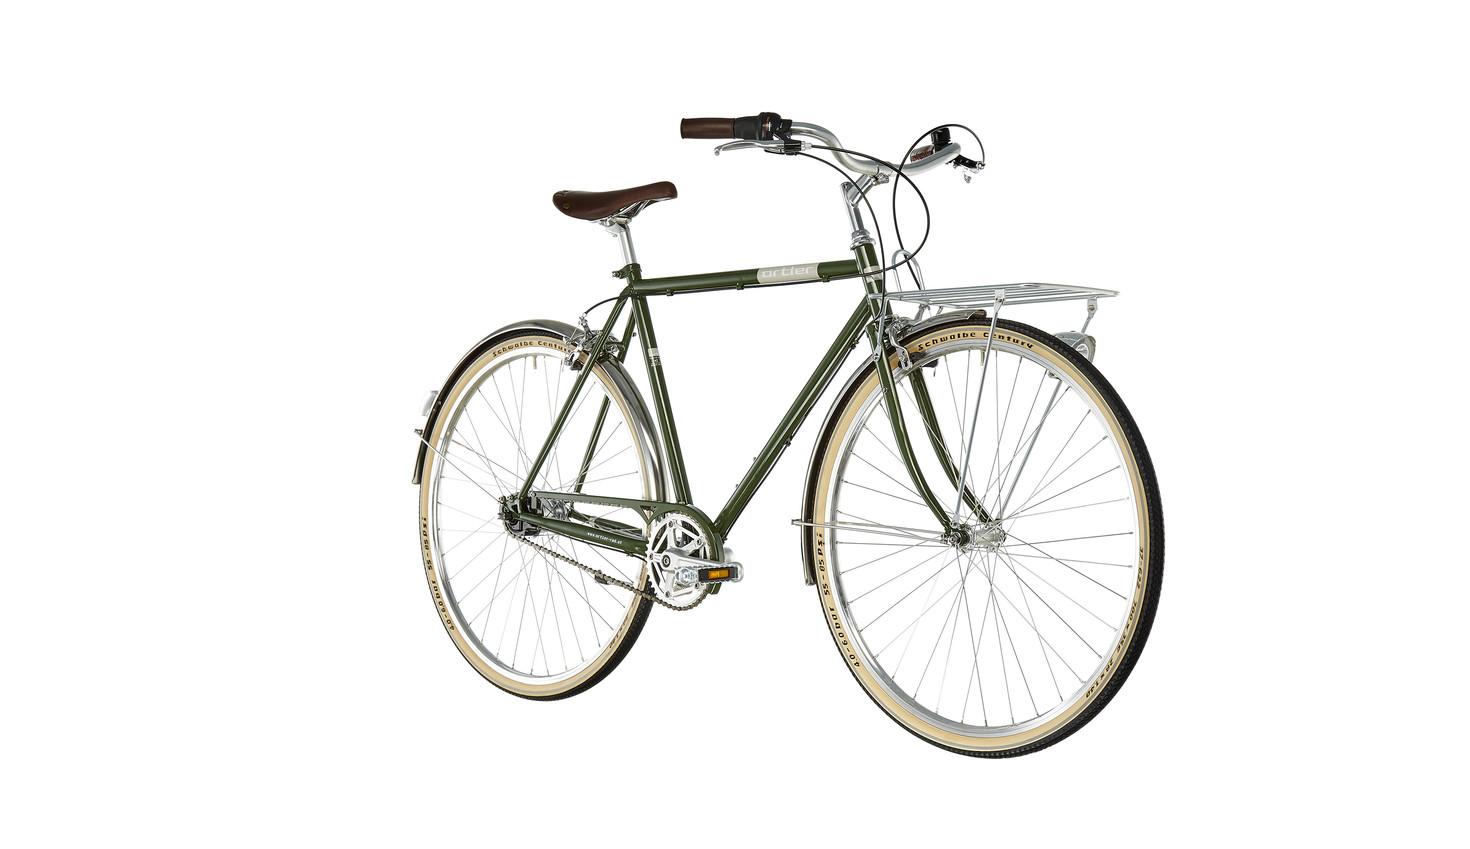 herren city rad stuttgart by bike. Black Bedroom Furniture Sets. Home Design Ideas